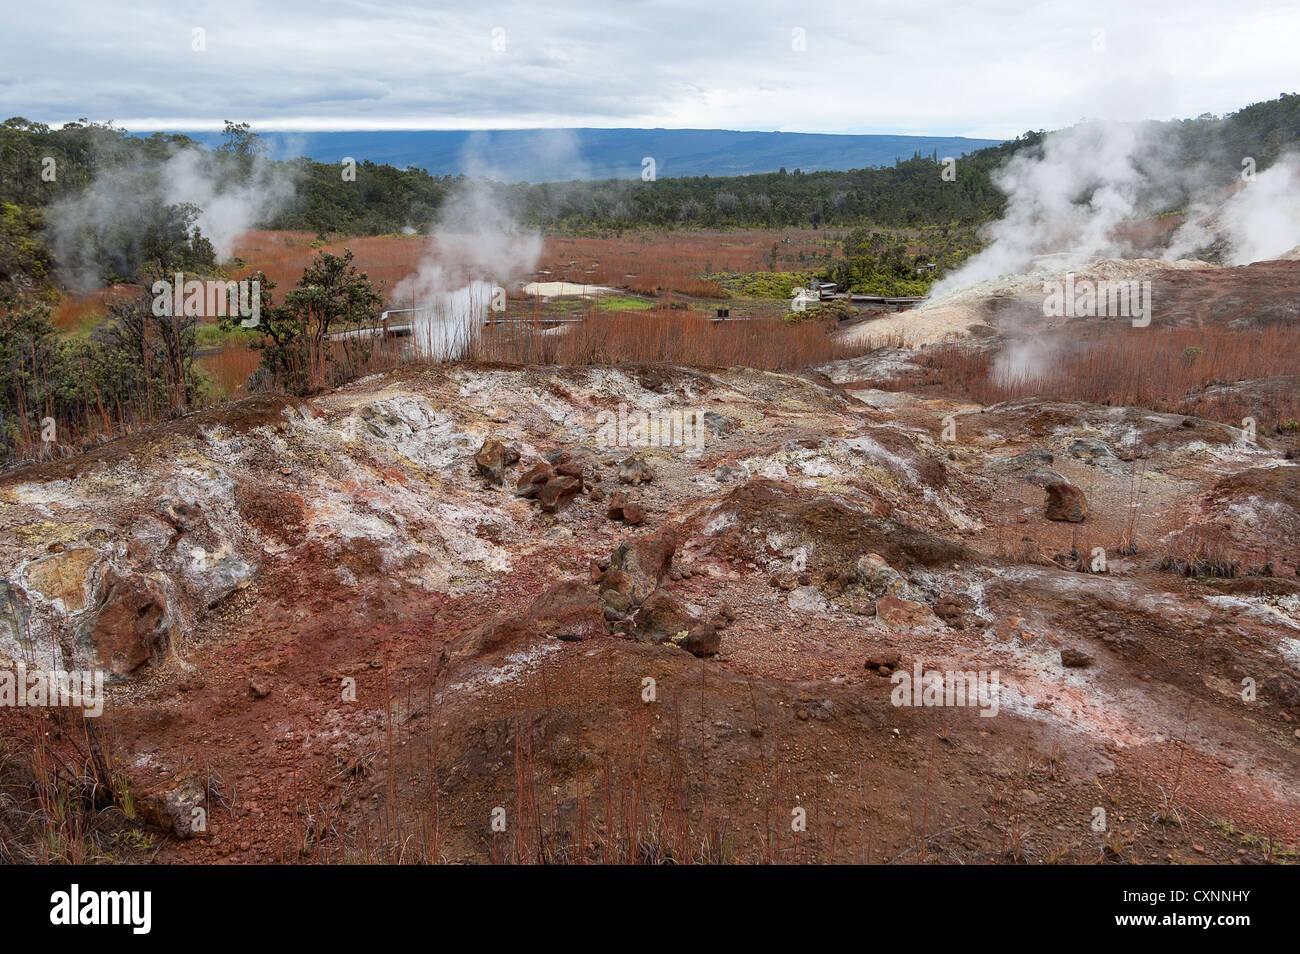 Elk284-2269 Hawaii, Big Island, Volcanoes National Park, Sulphur Banks - Stock Image